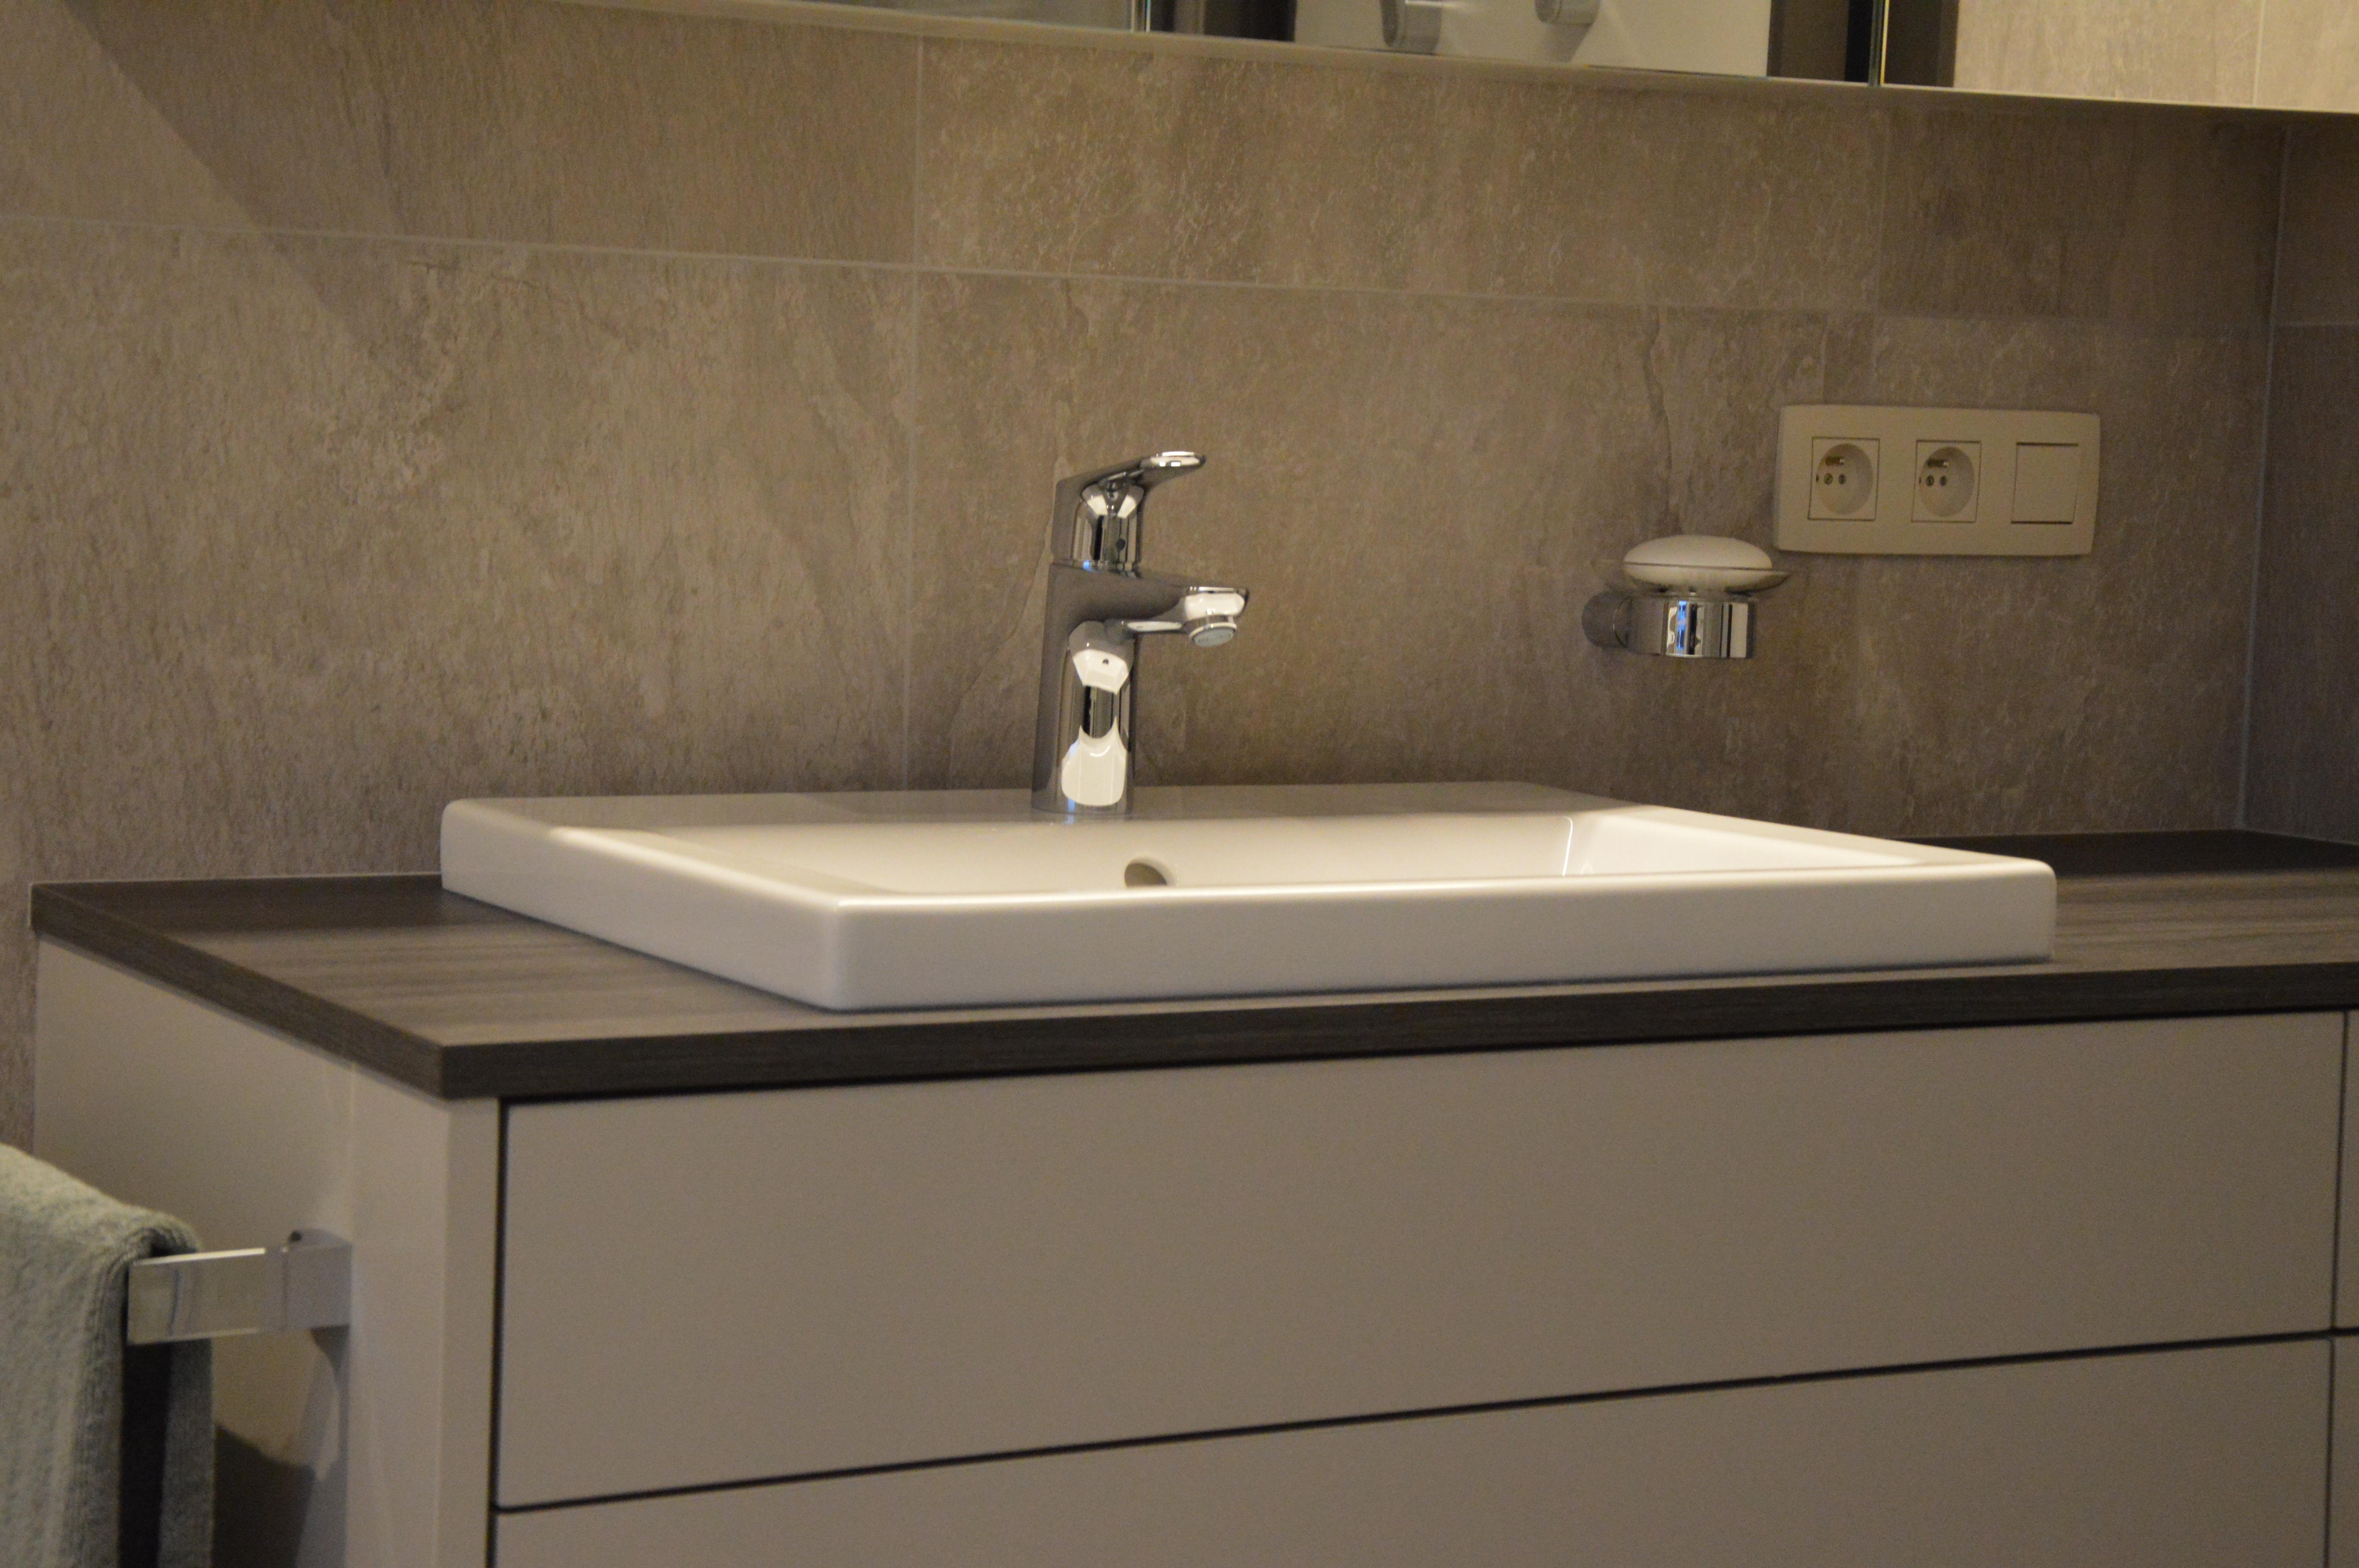 Badkamer Opberg Ideeen : Opberg ideeen kleine badkamer